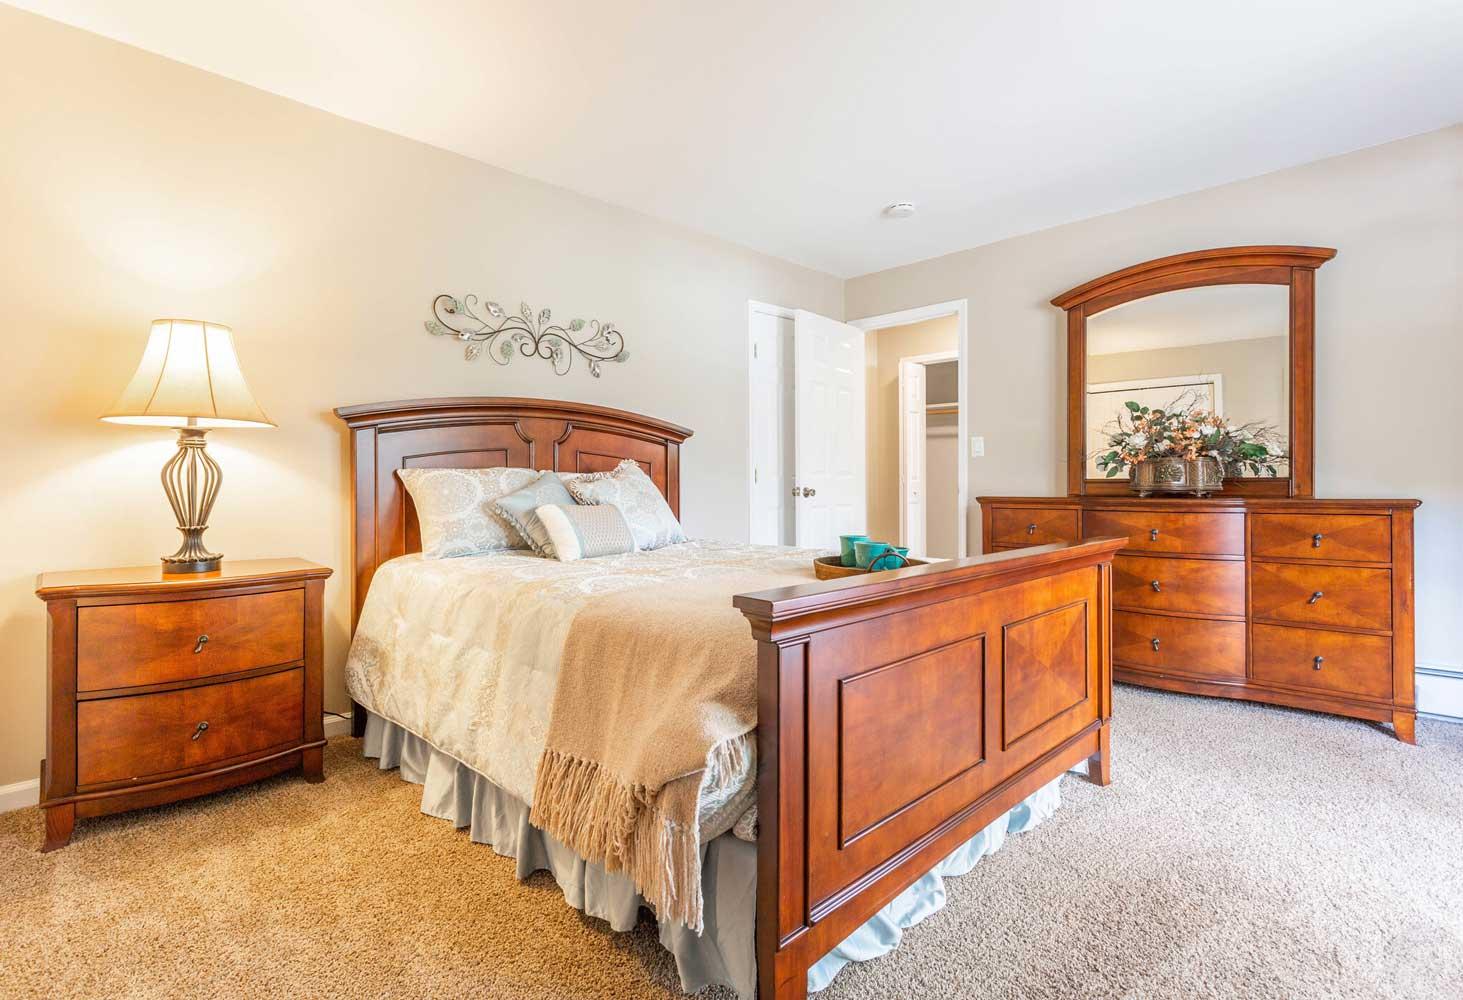 Bedroom at Mountainview Gardens Apartments in Fishkill, NY